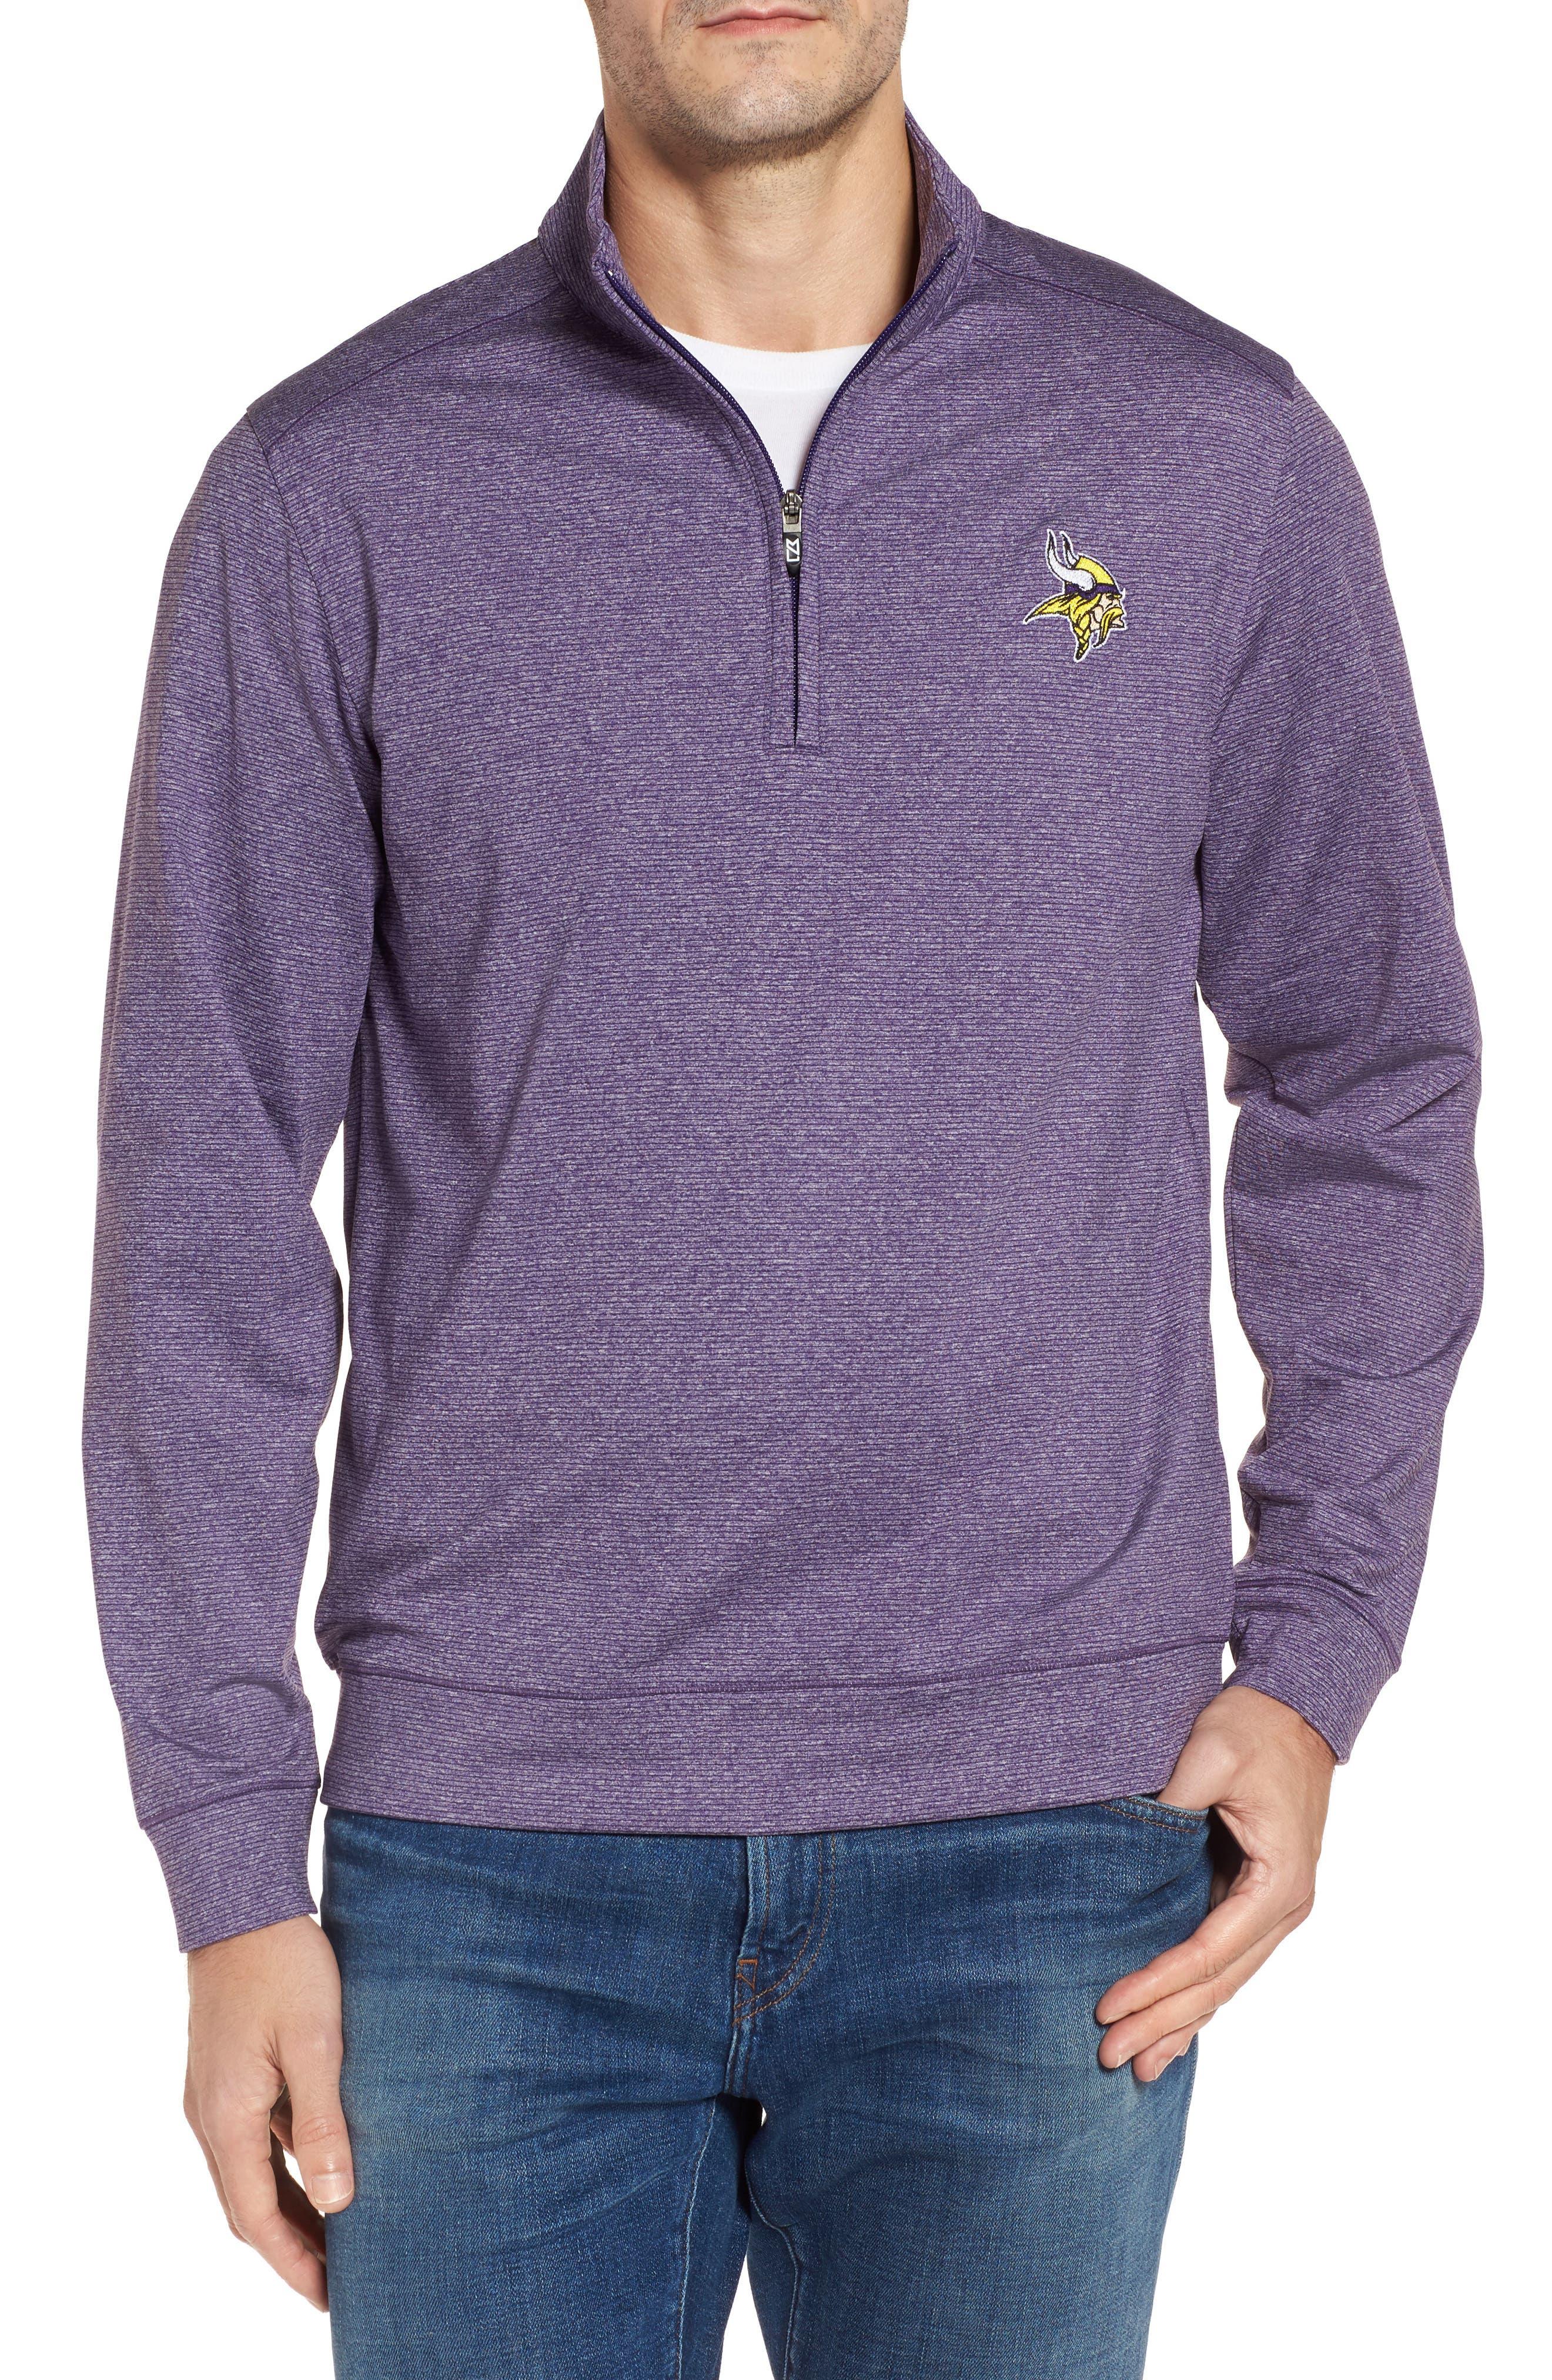 Shoreline - Minnesota Vikings Half Zip Pullover,                         Main,                         color, College Purple Heather